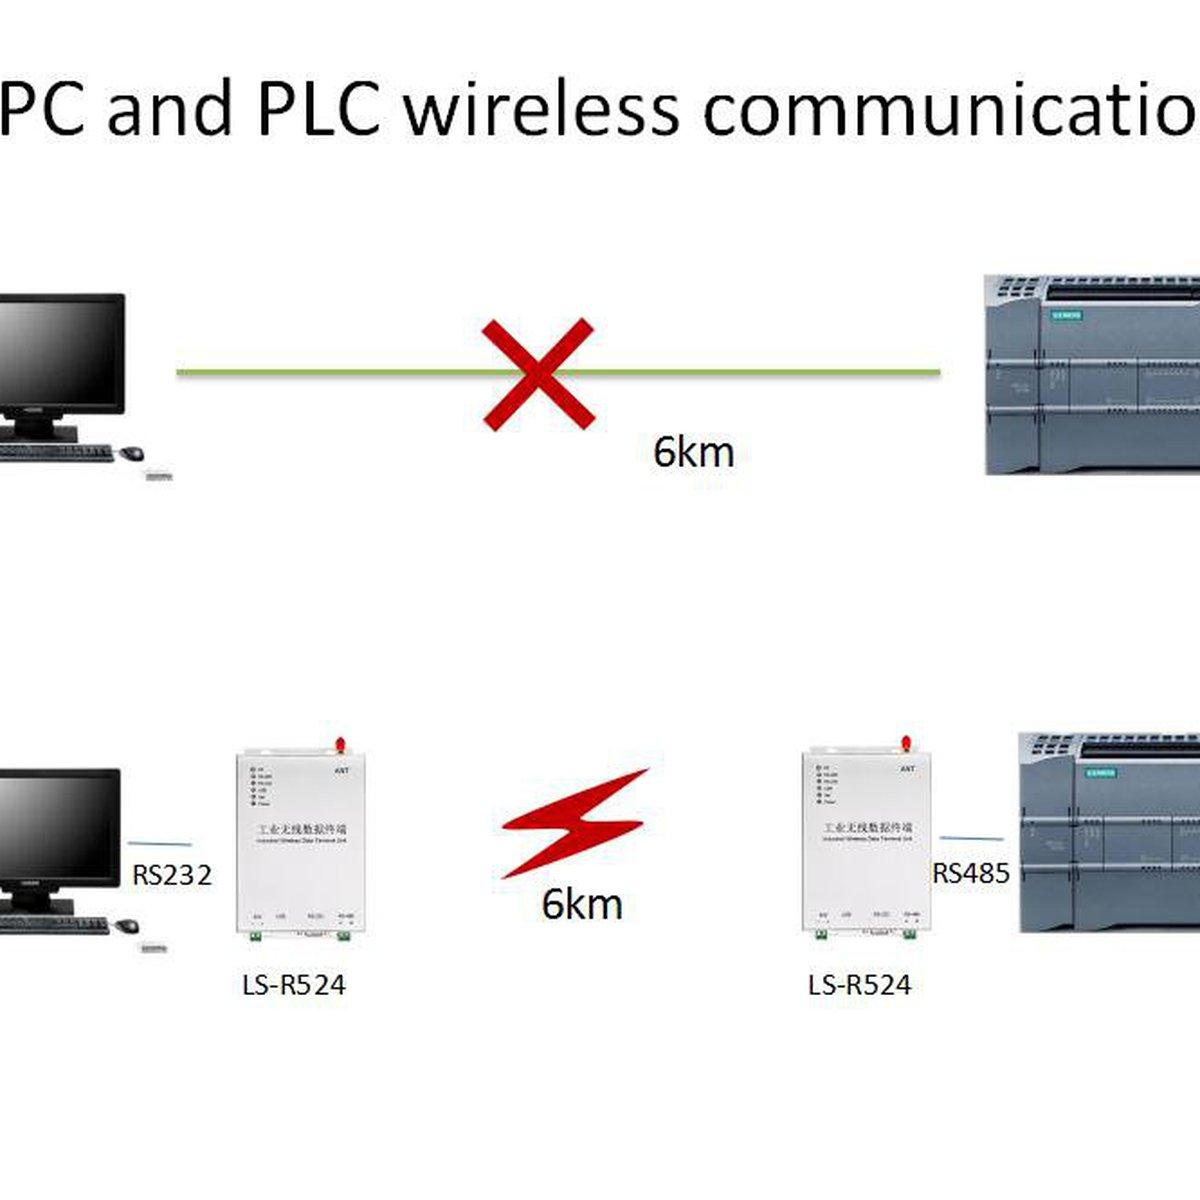 5W 24V wireless DTU PLC wireless link modules from Lensen